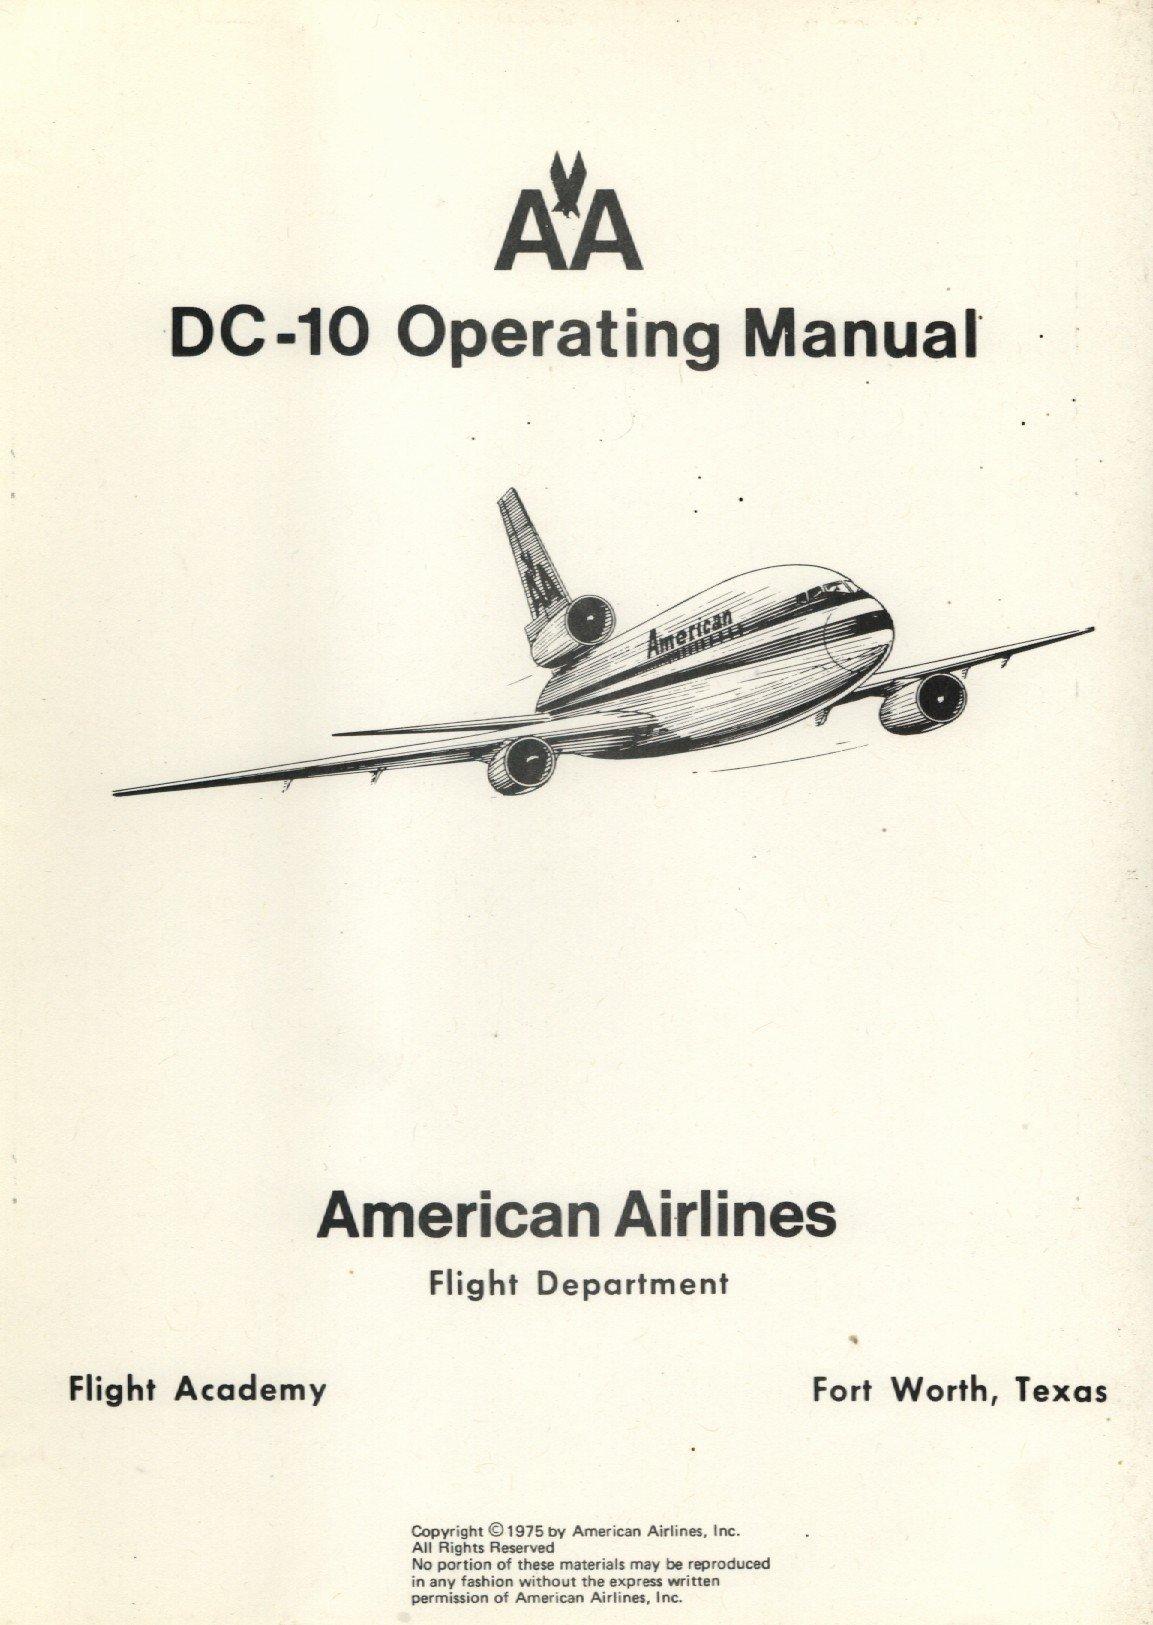 american airlines flight academy - Monza berglauf-verband com